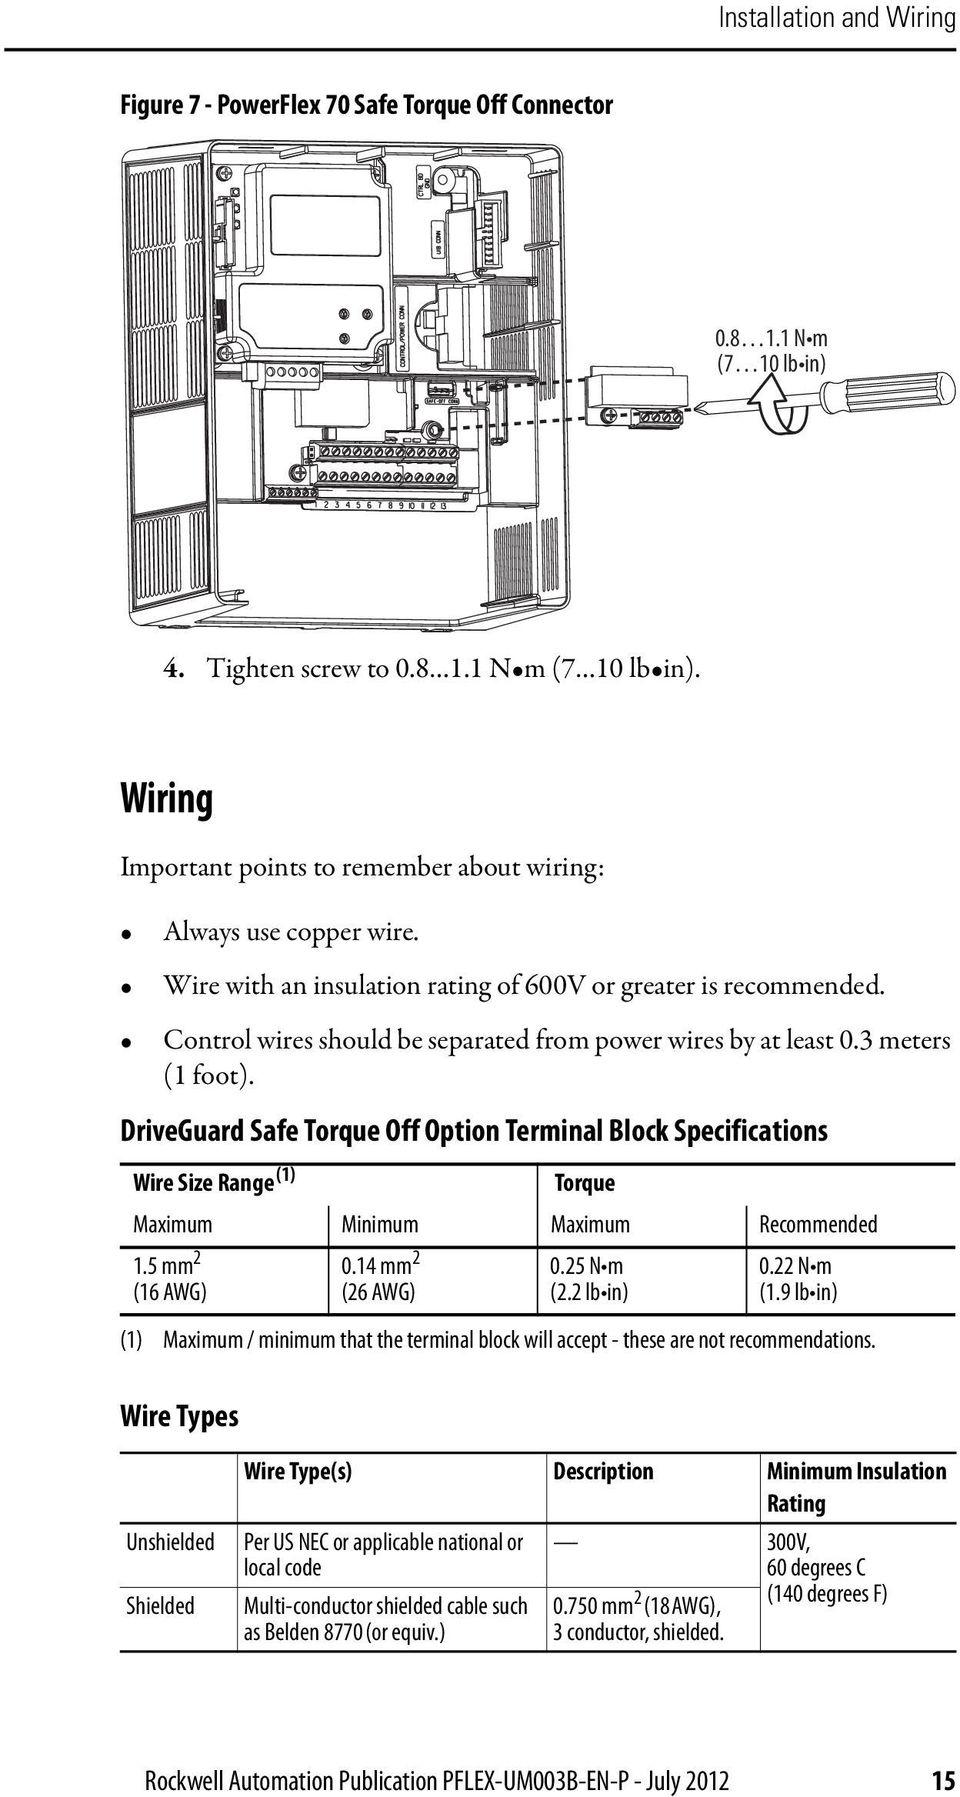 hight resolution of torque 8 wire diagram wiring diagram basictorque 8 wire diagram wiring diagrampowerflex 70 safe off wiring